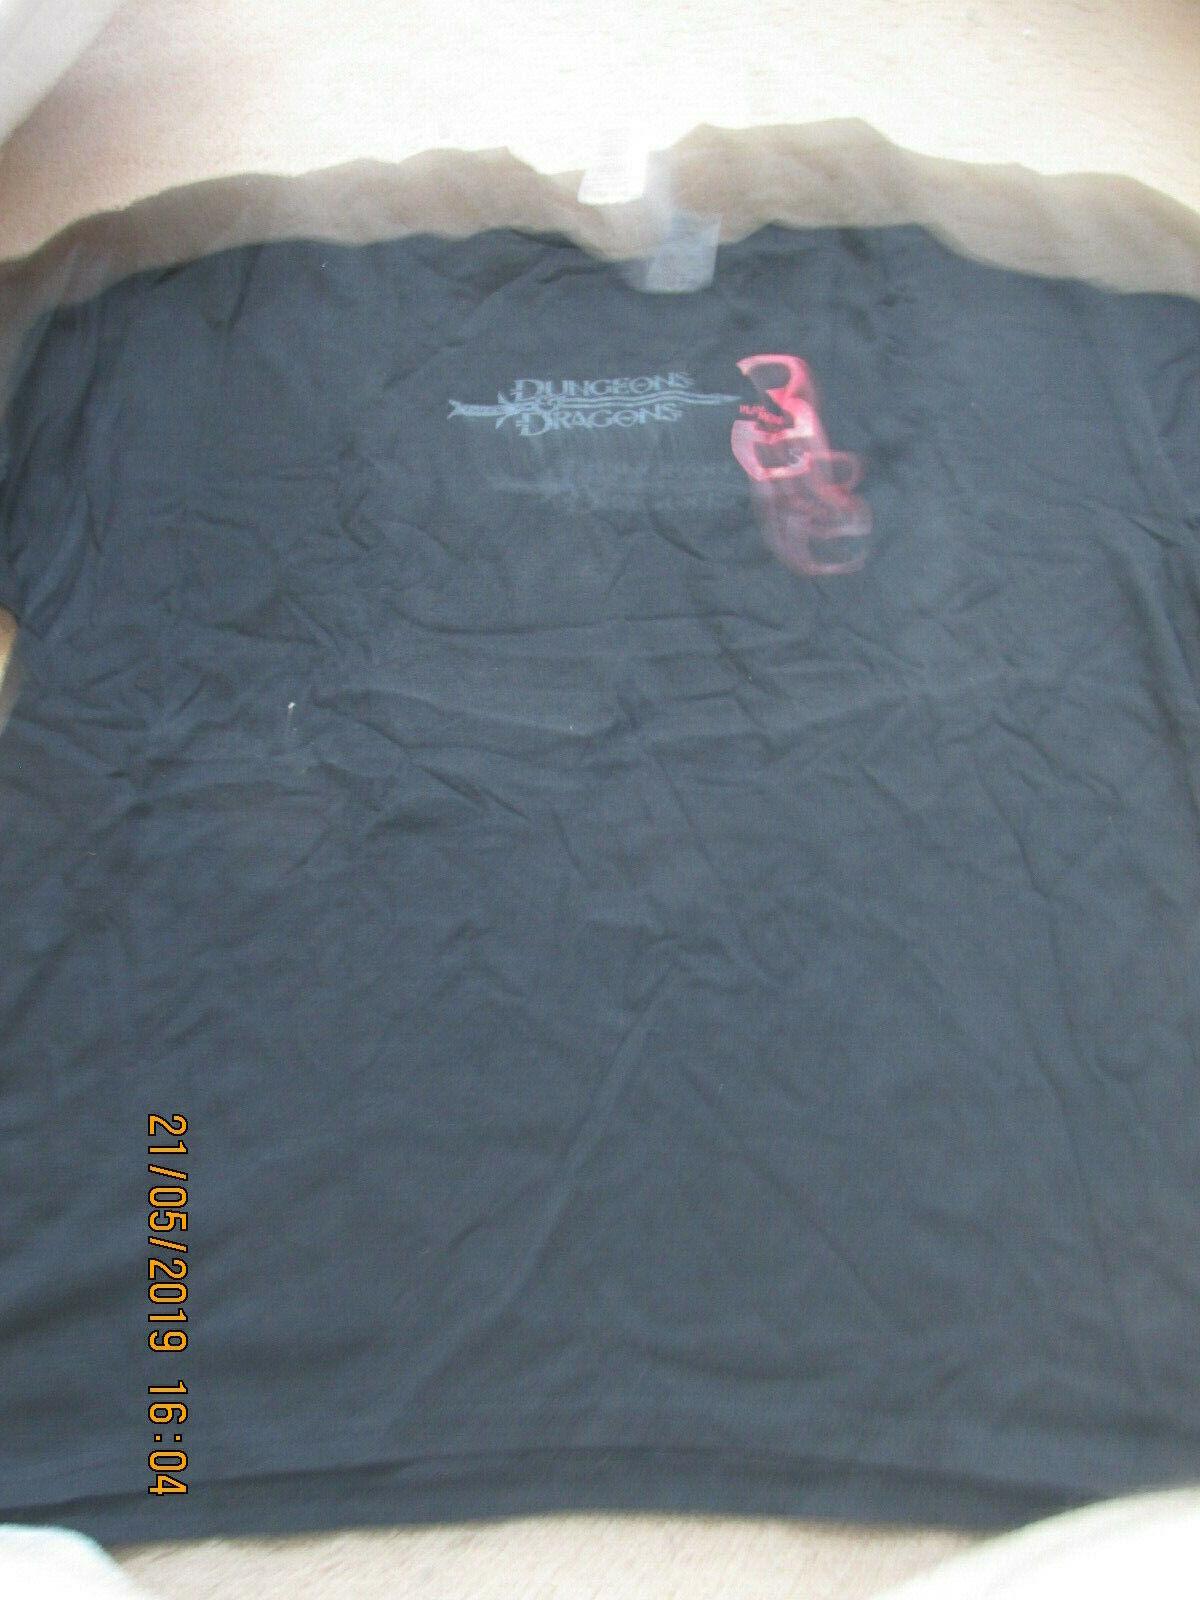 Dungeons DRAGONS WOTC 3.5E Pit Fiend En Espalda camiseta Negro XL